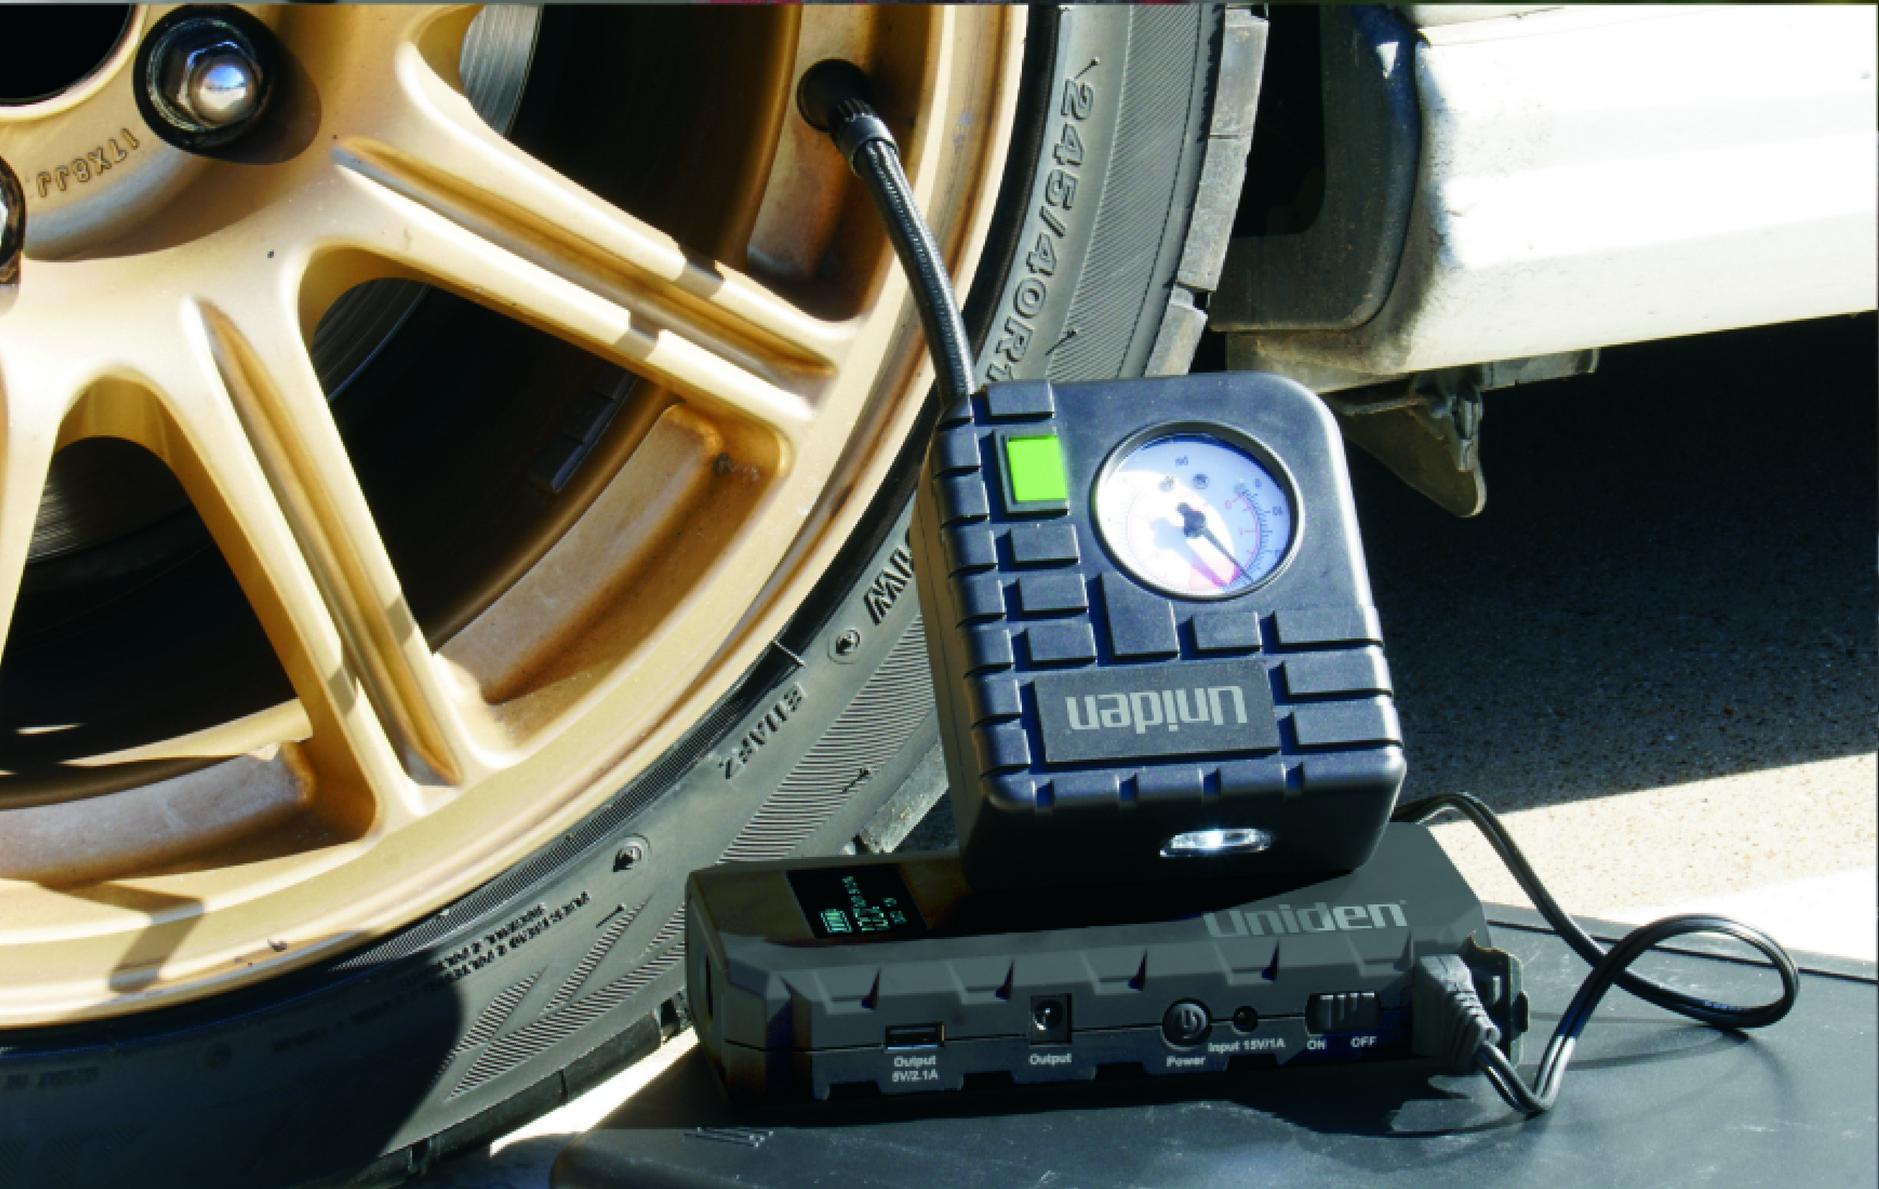 New portable jump-start kit from Uniden